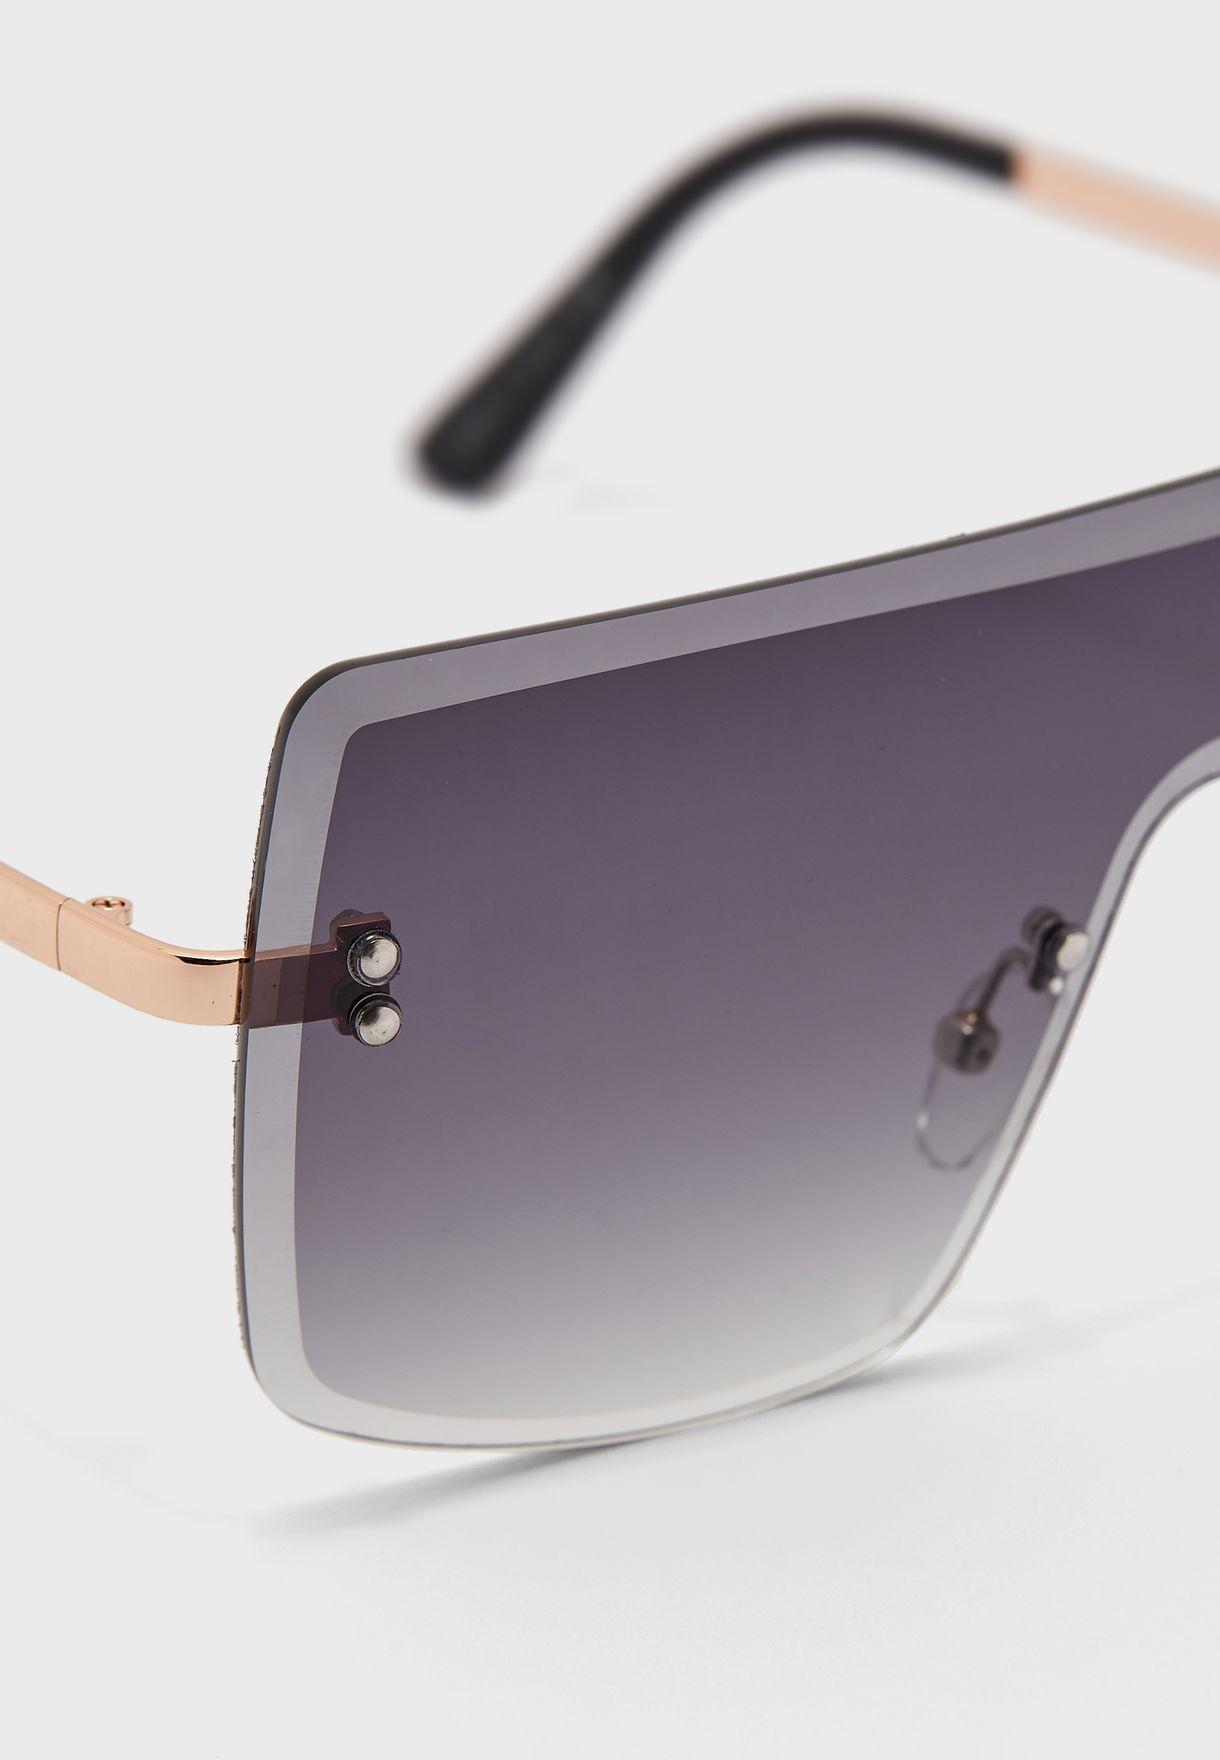 Ocorenna Oversized Sunglasses